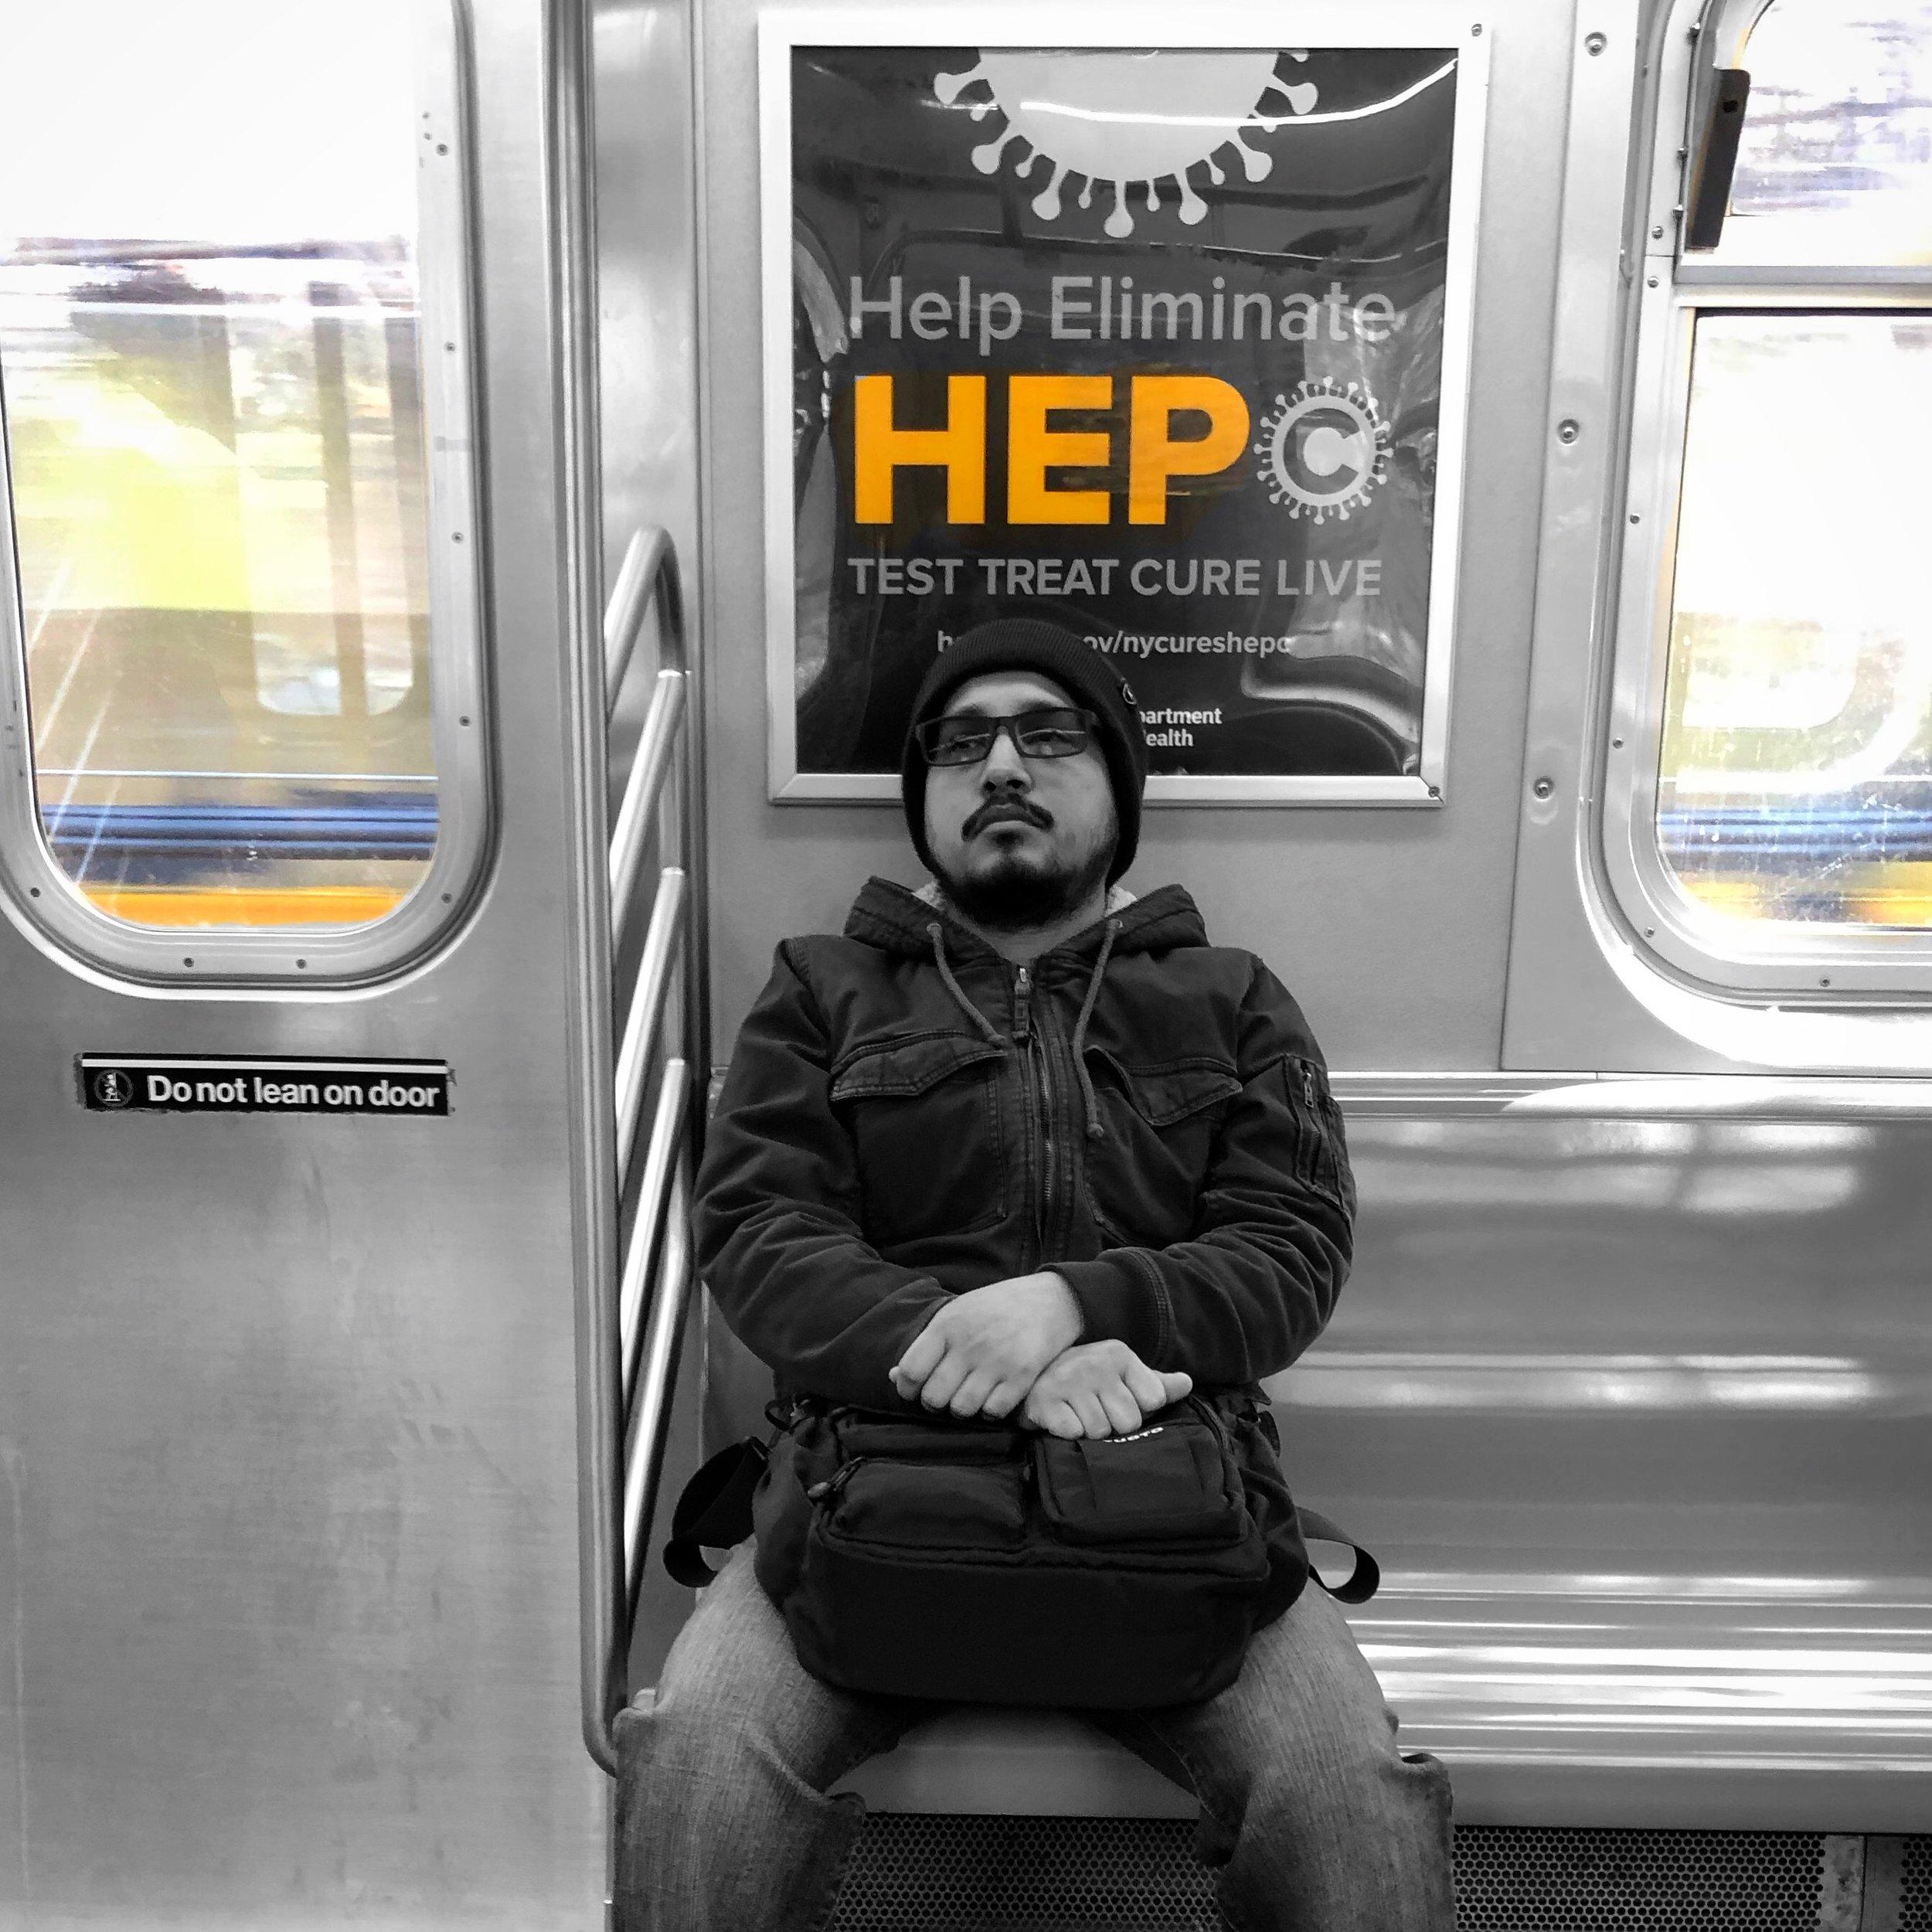 Hep (April 3, 2019)